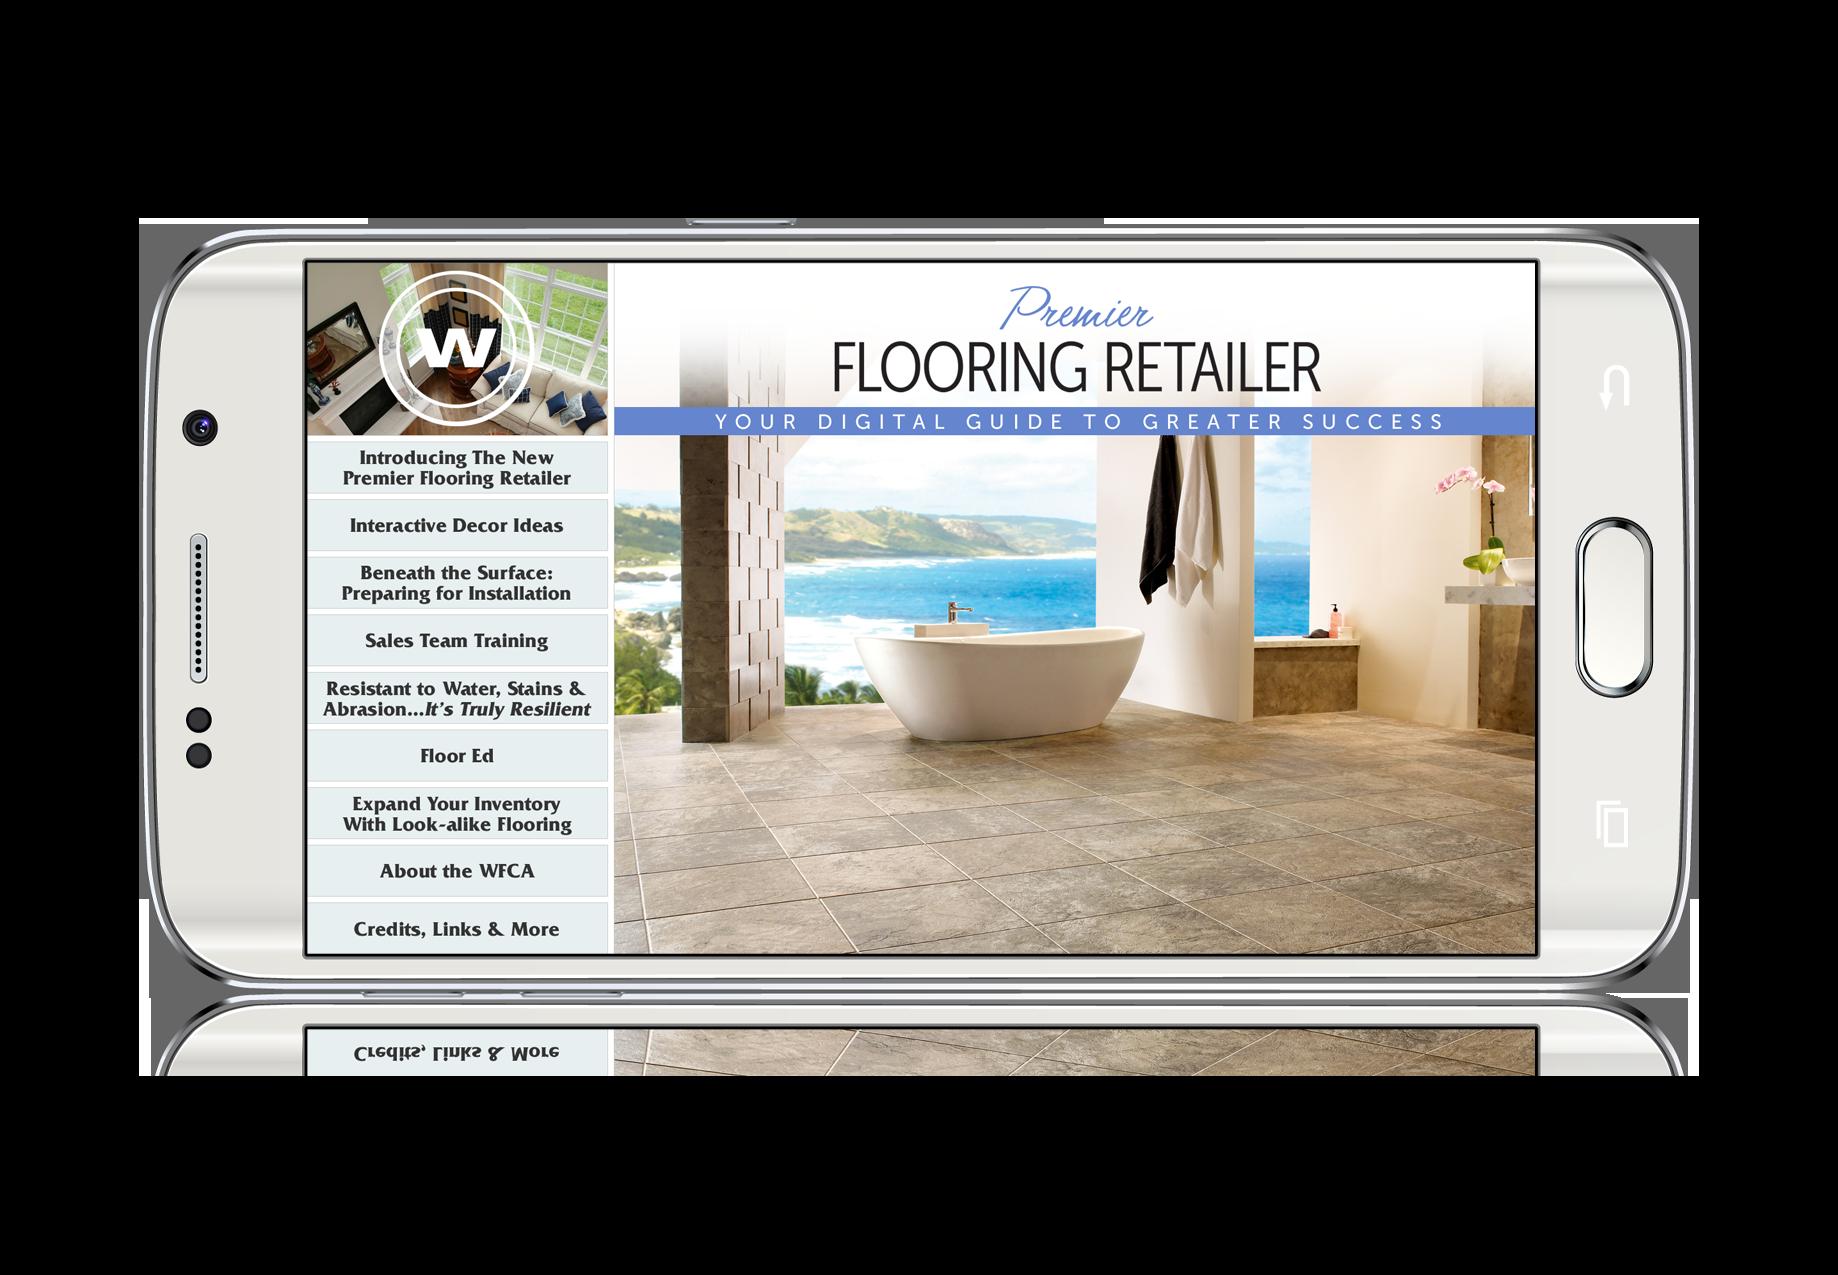 Premier Flooring Retailer Magazine - Mobile App - Nationwide